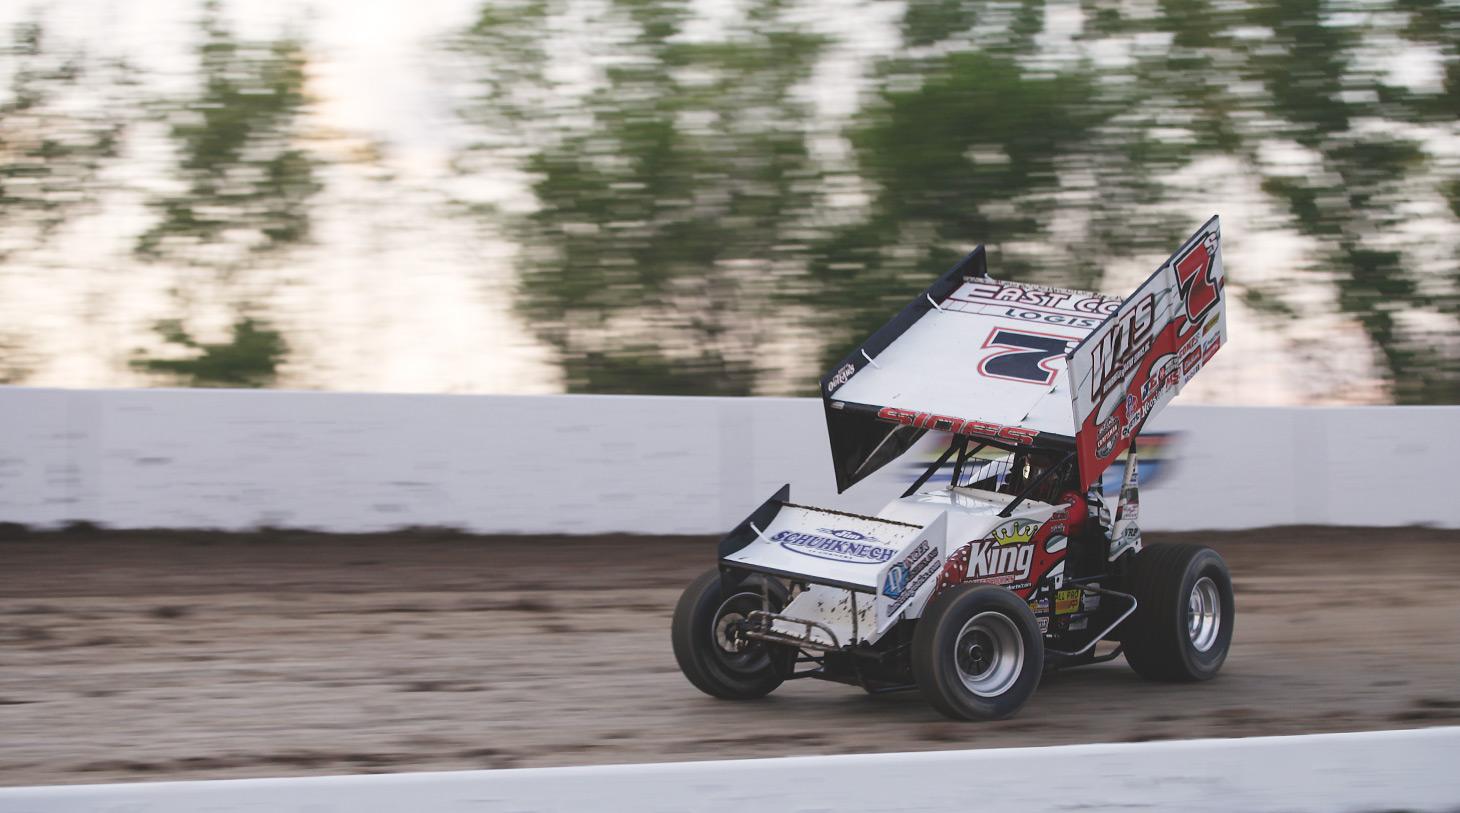 Jason Sides on the hammer through turn 3 at Weedsport Speedway. (Jeffrey Turford / TDP)